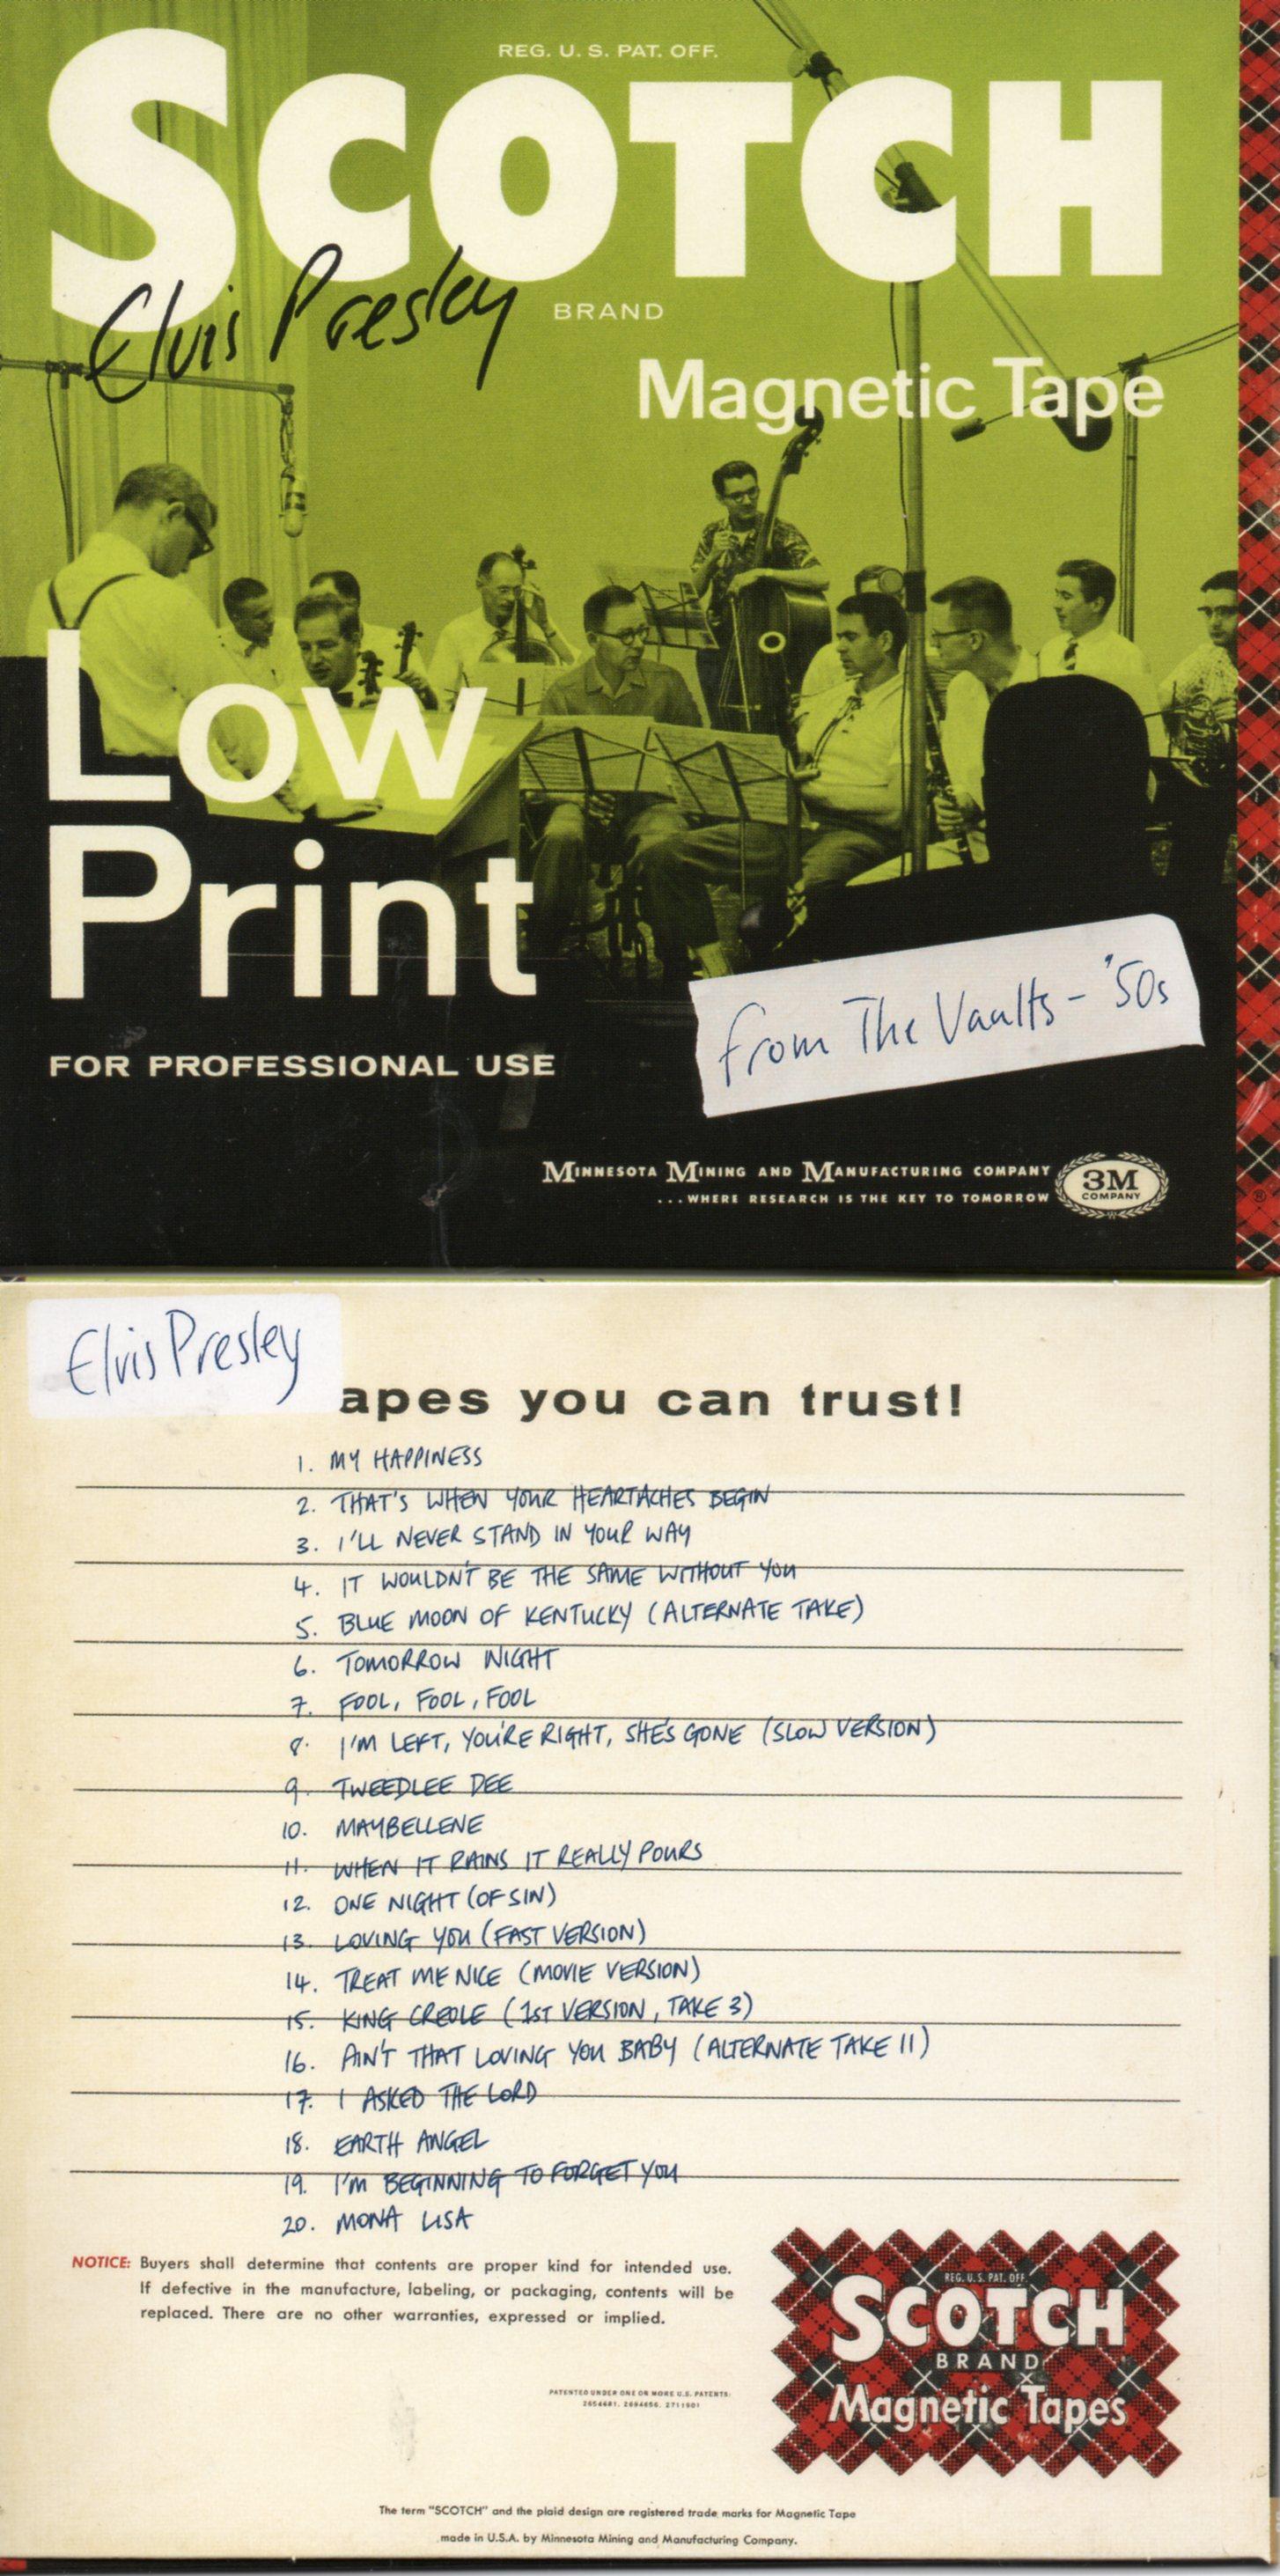 Elvis PRESLEY - From The Vaults '50s - Cardboard Sleeve - 20-track Rare Tracks